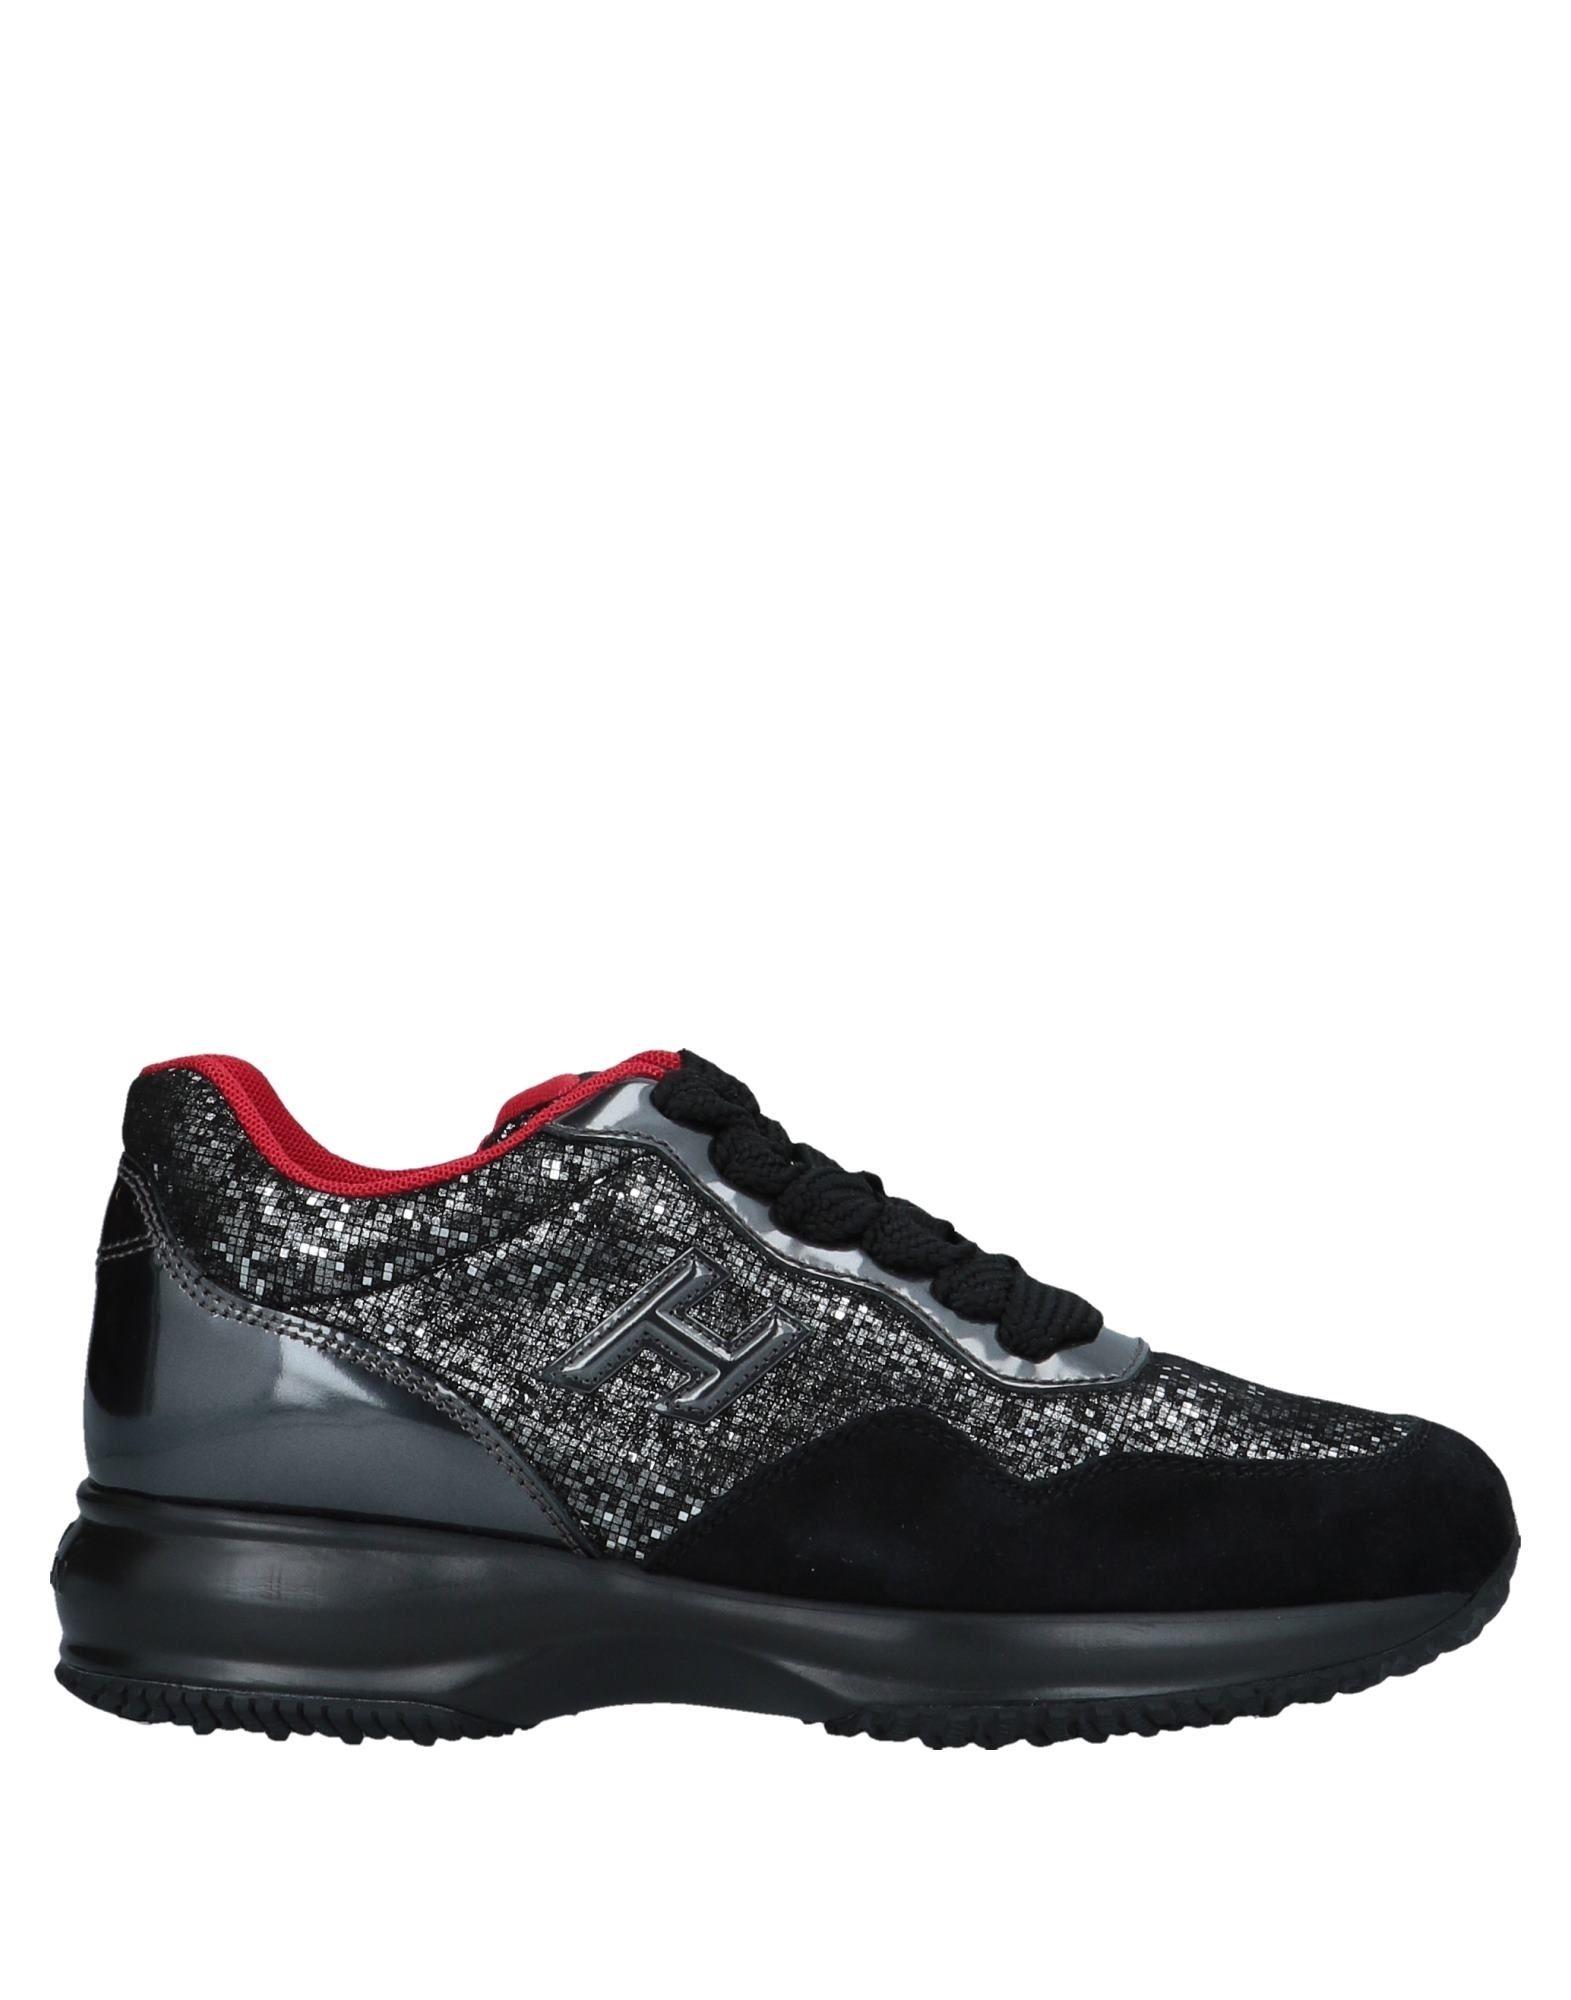 Moda Sneakers Hogan Donna - 11540190WE